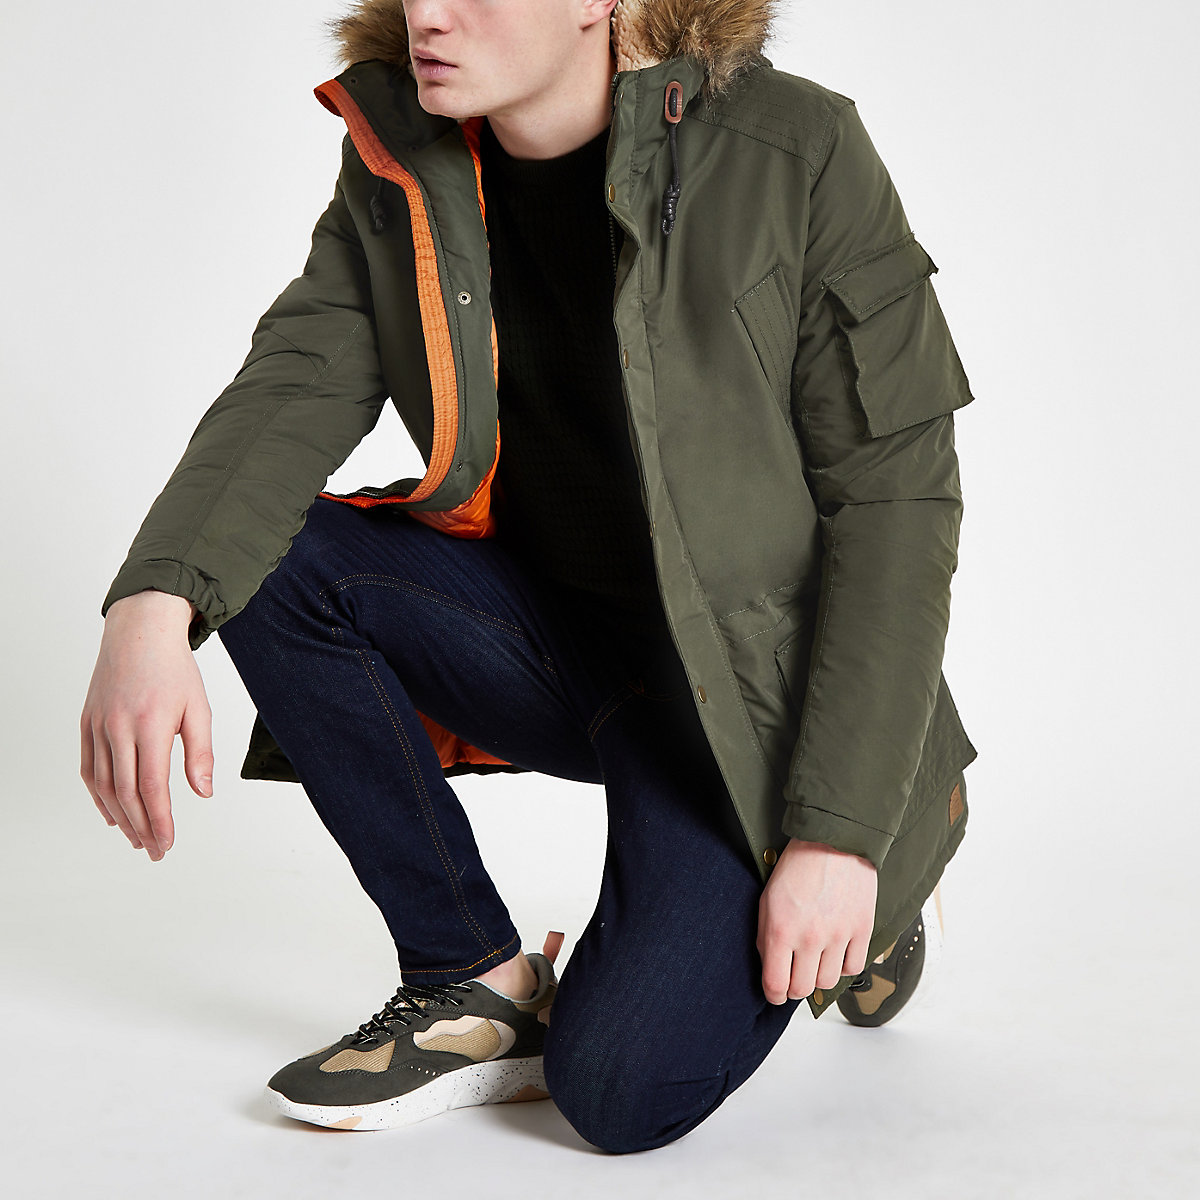 Jack & Jones green hooded parka jacket